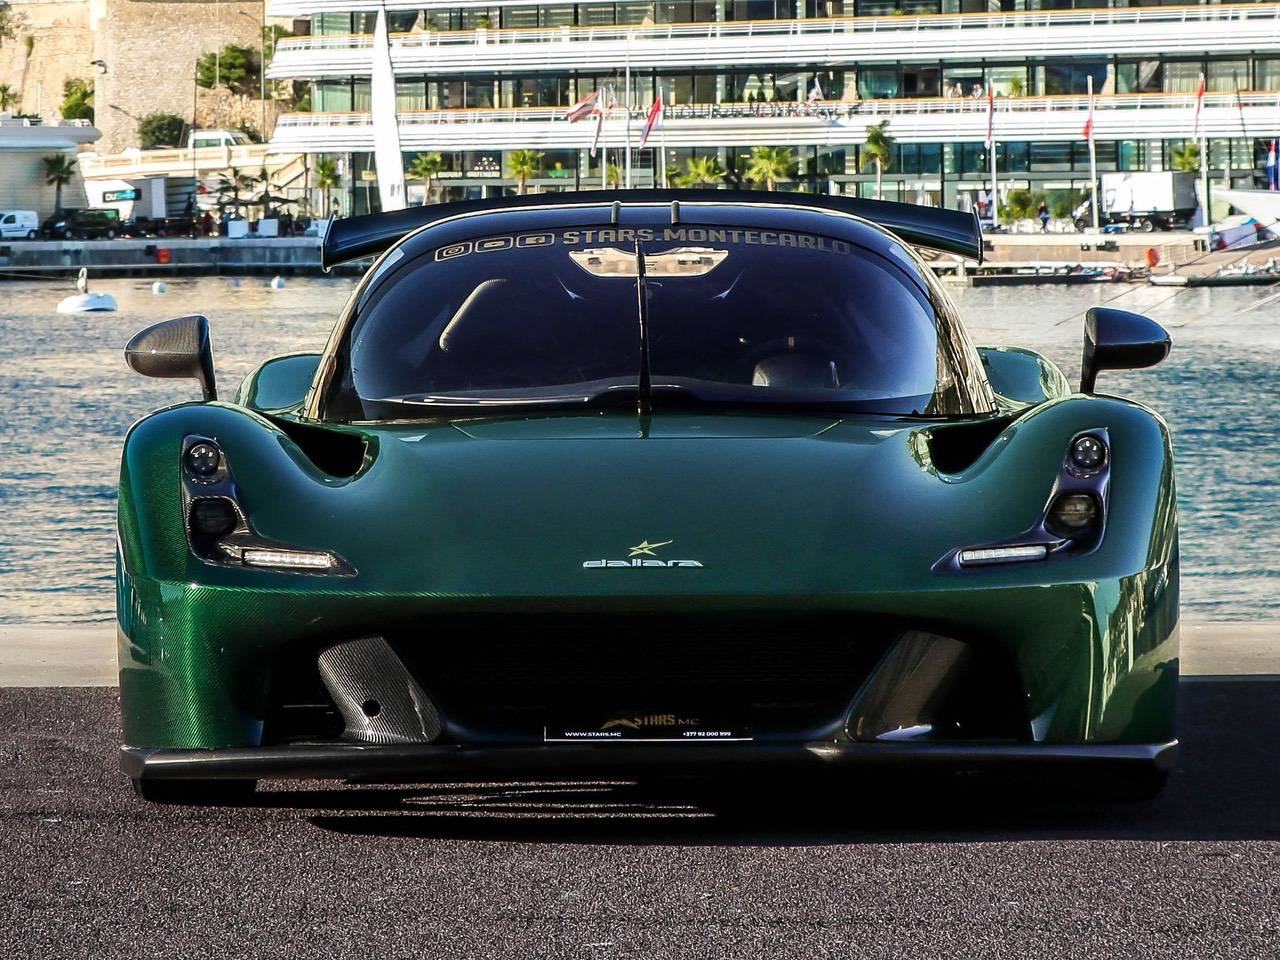 Dallara-Stradale-Convertible-Carbon-6